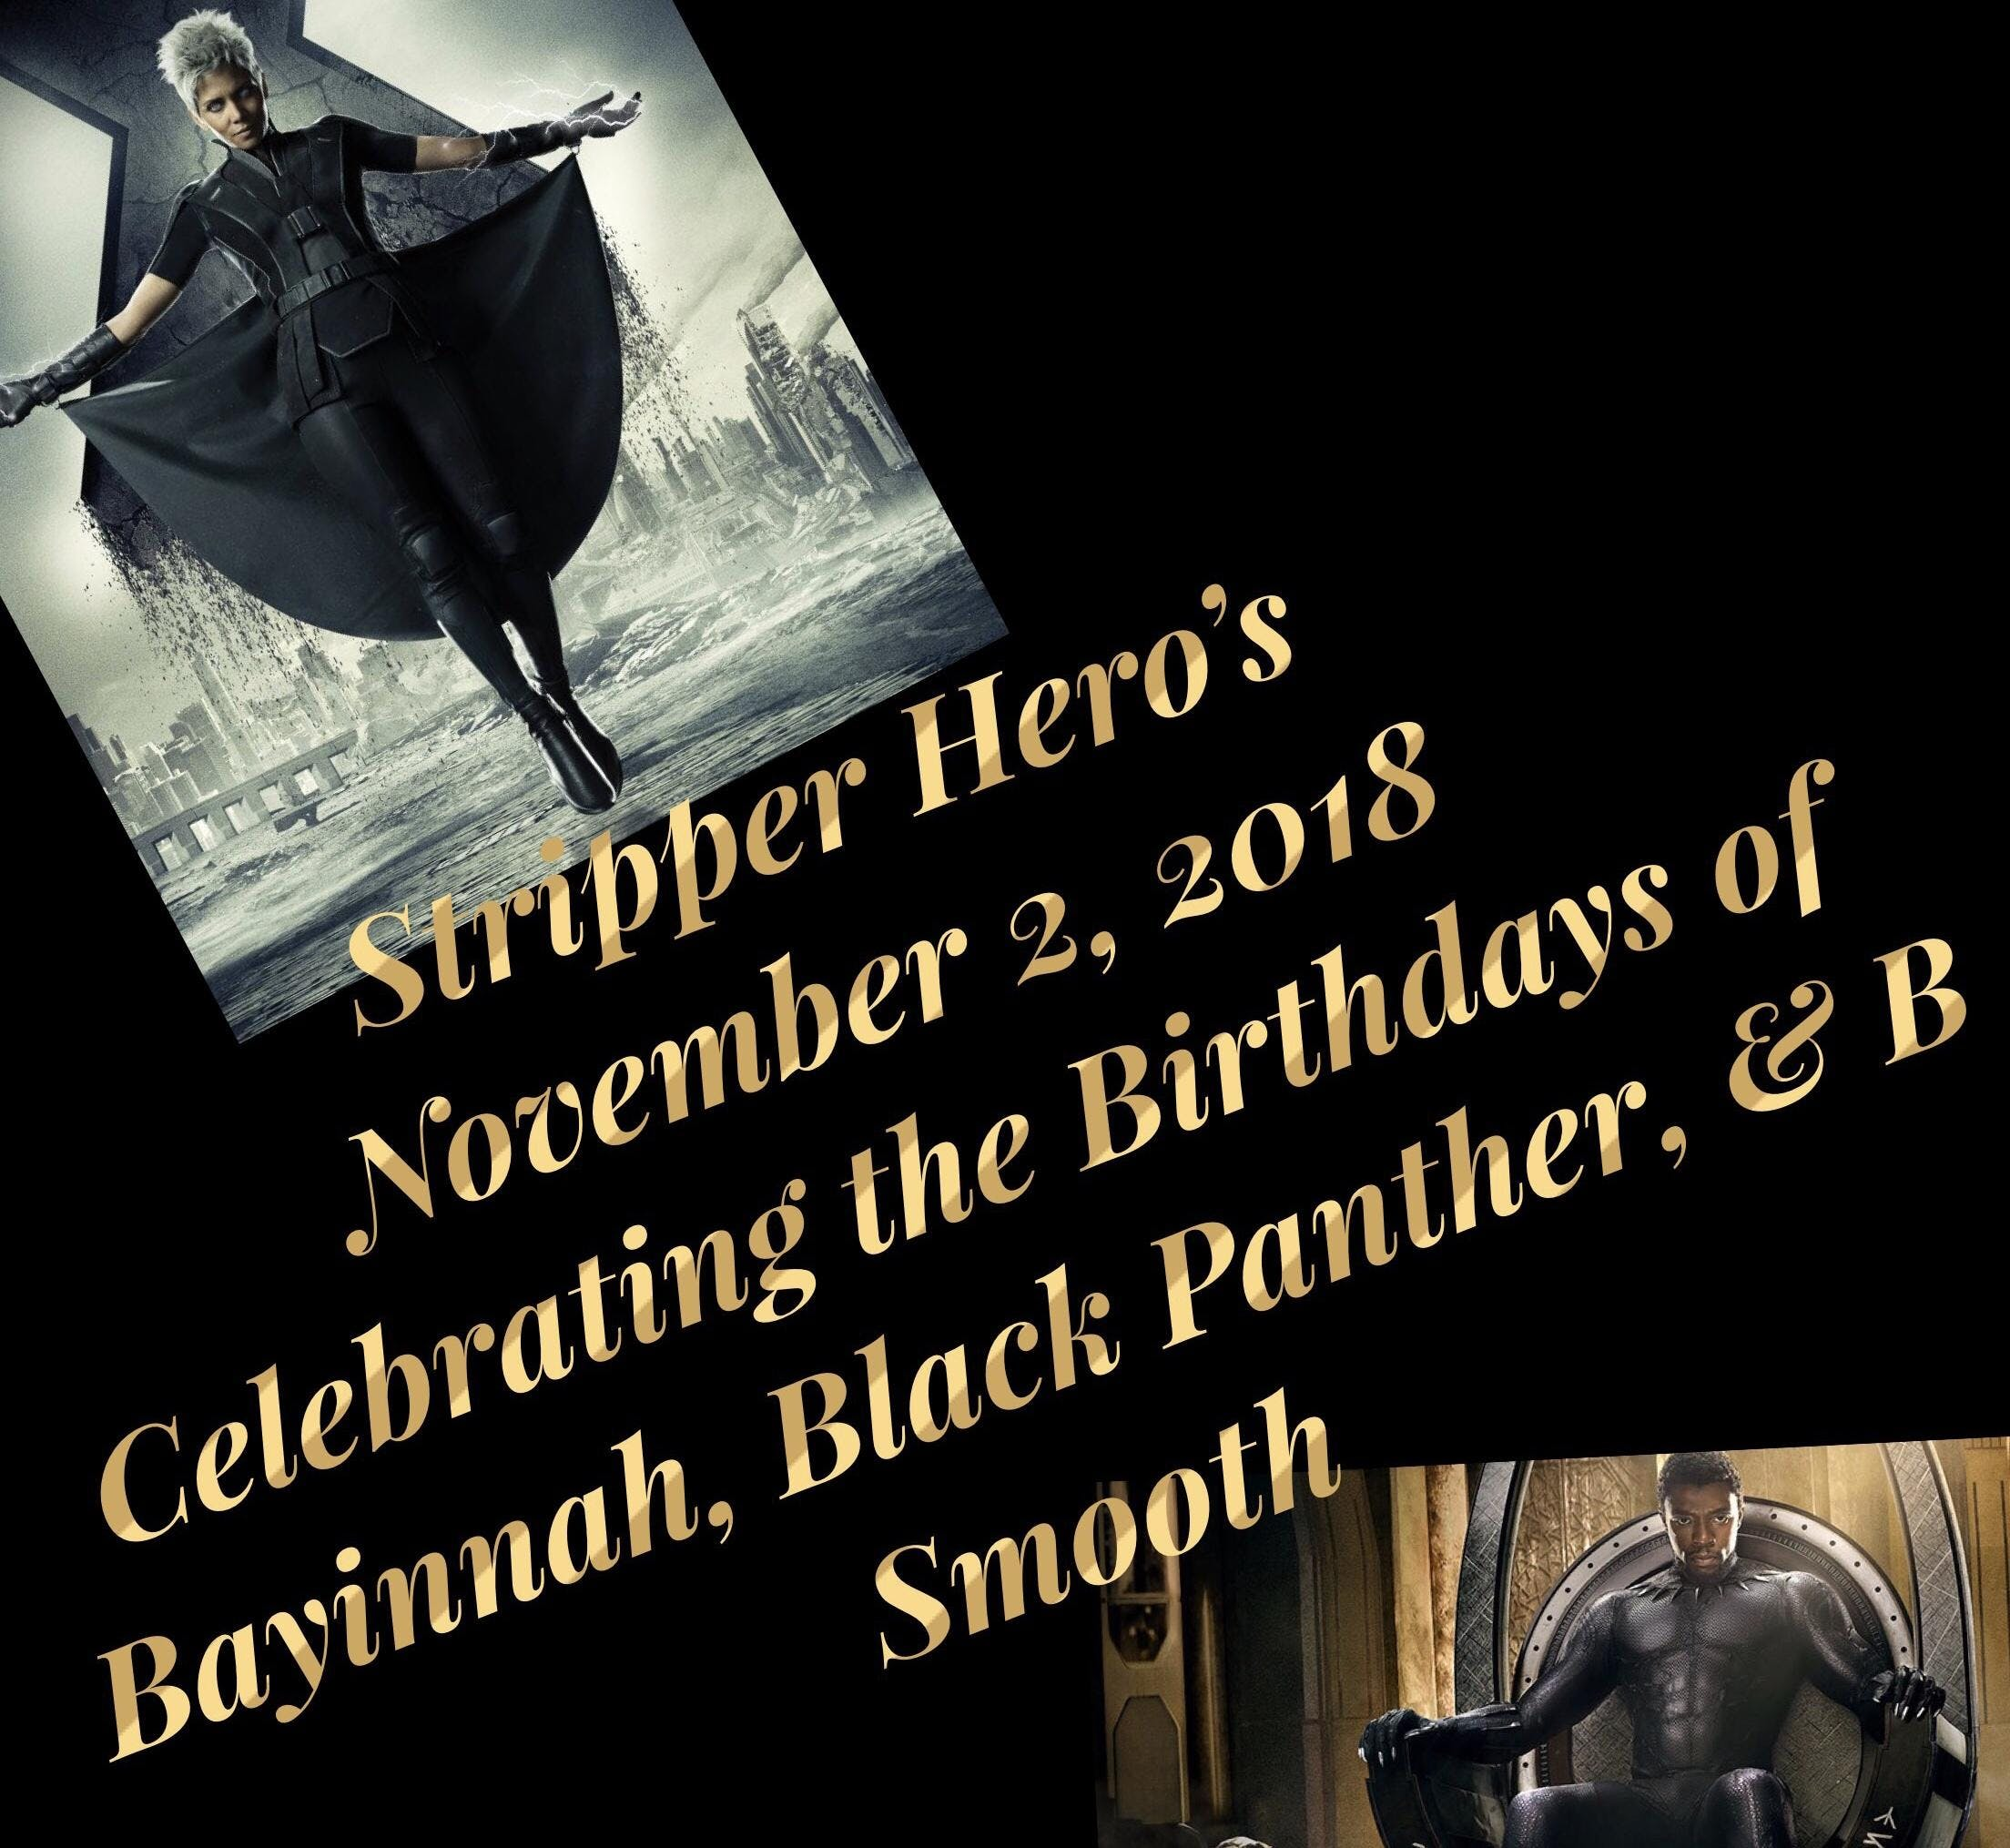 STRIPPER HEROS CELEBRATING THE BDAY OF LADY B &amp BLACK PANTHER